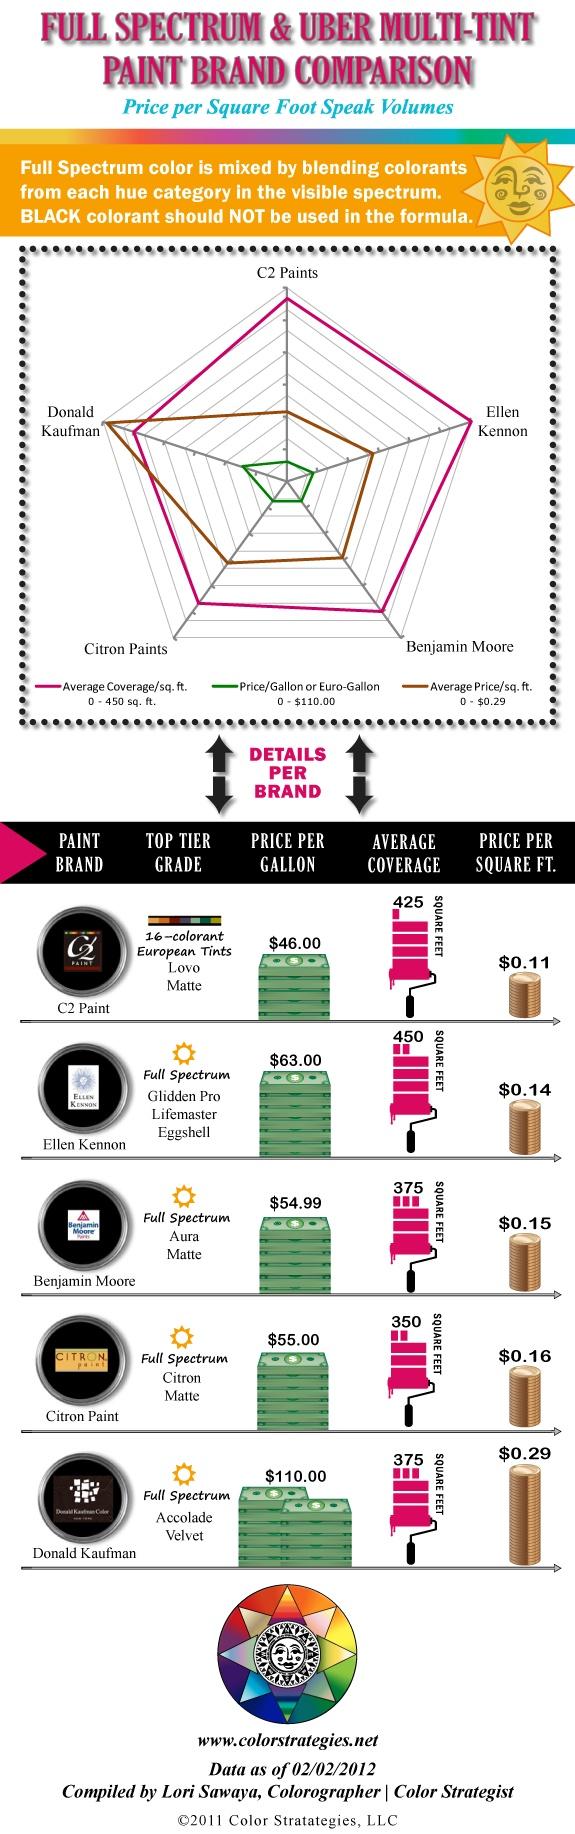 Full Spectrum Paint Price Comparison Of All Full Spectrum Brands Available.